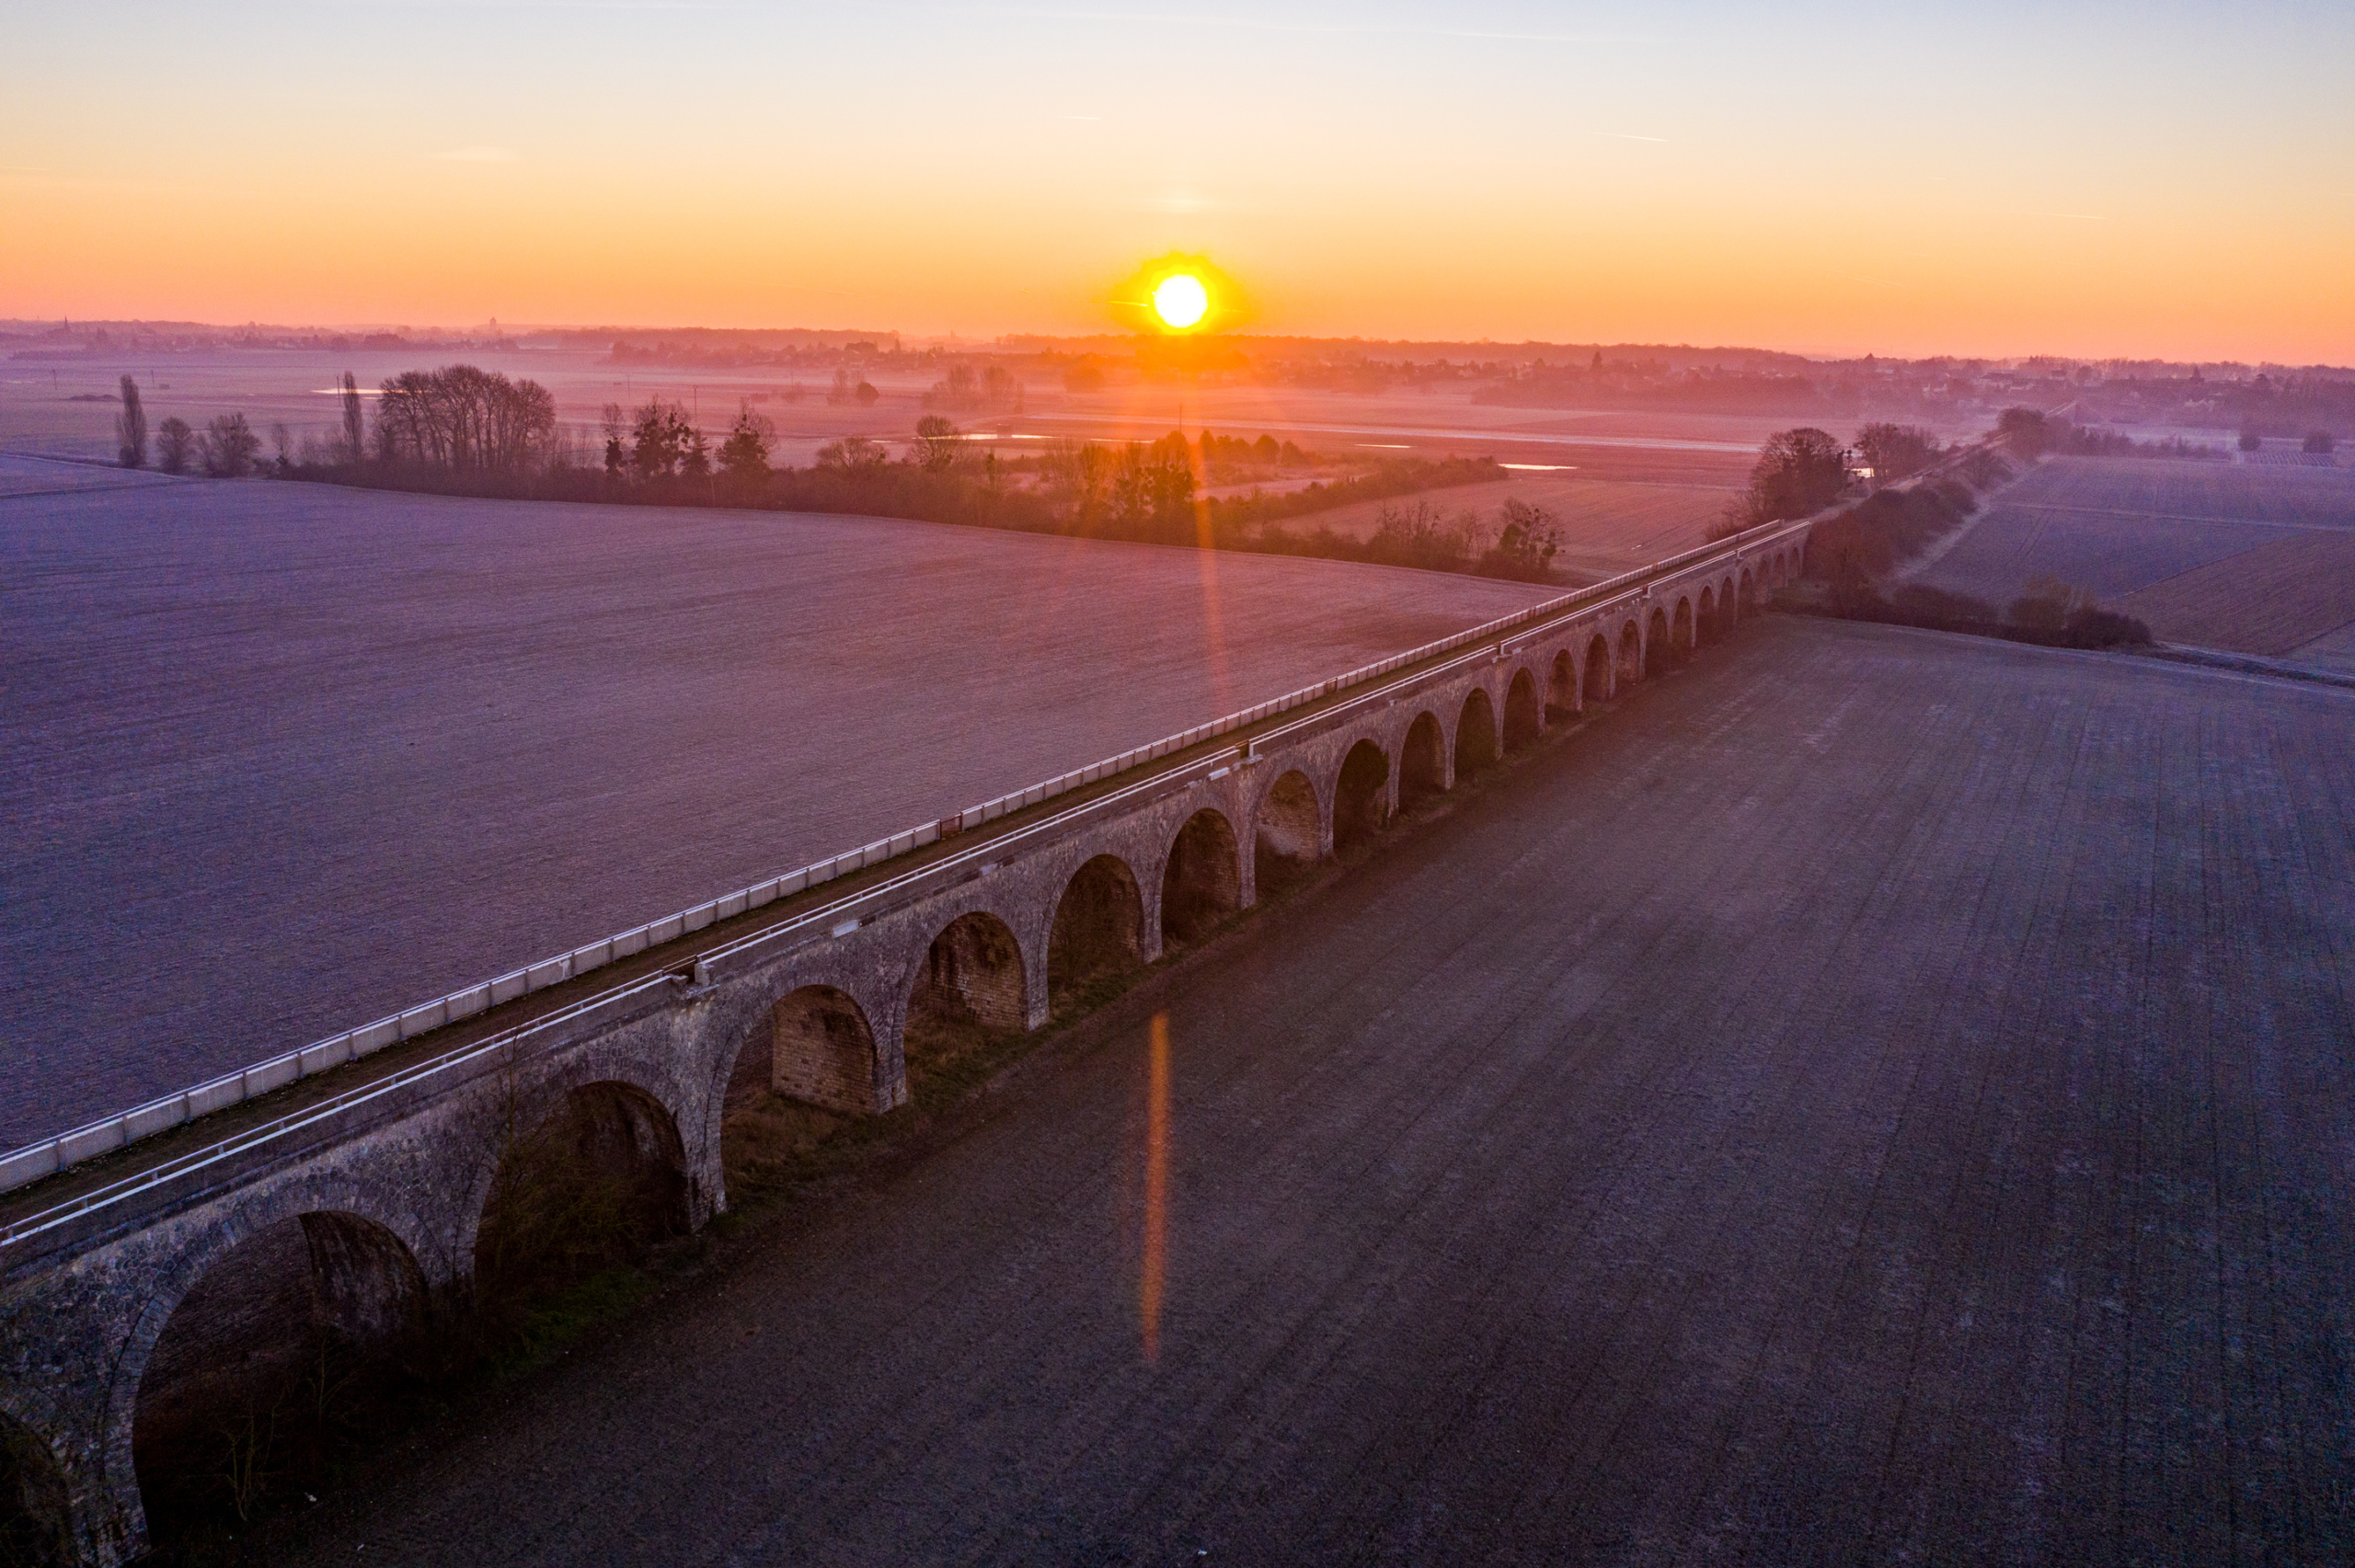 Viaduc des Noels - Vineuil